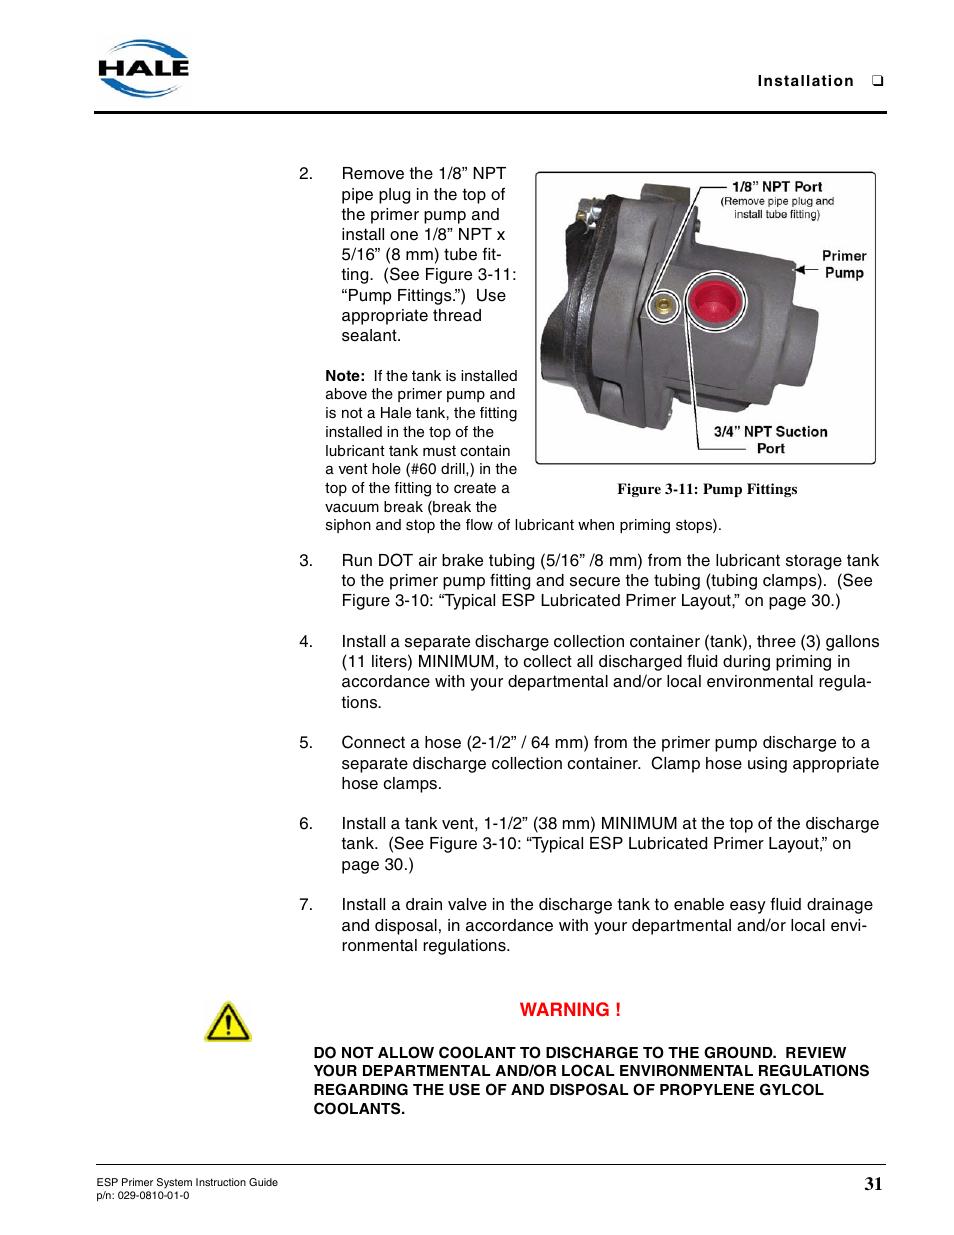 medium resolution of figure 3 11 pump fittings hale esp priming system user manualfigure 3 11 pump fittings hale